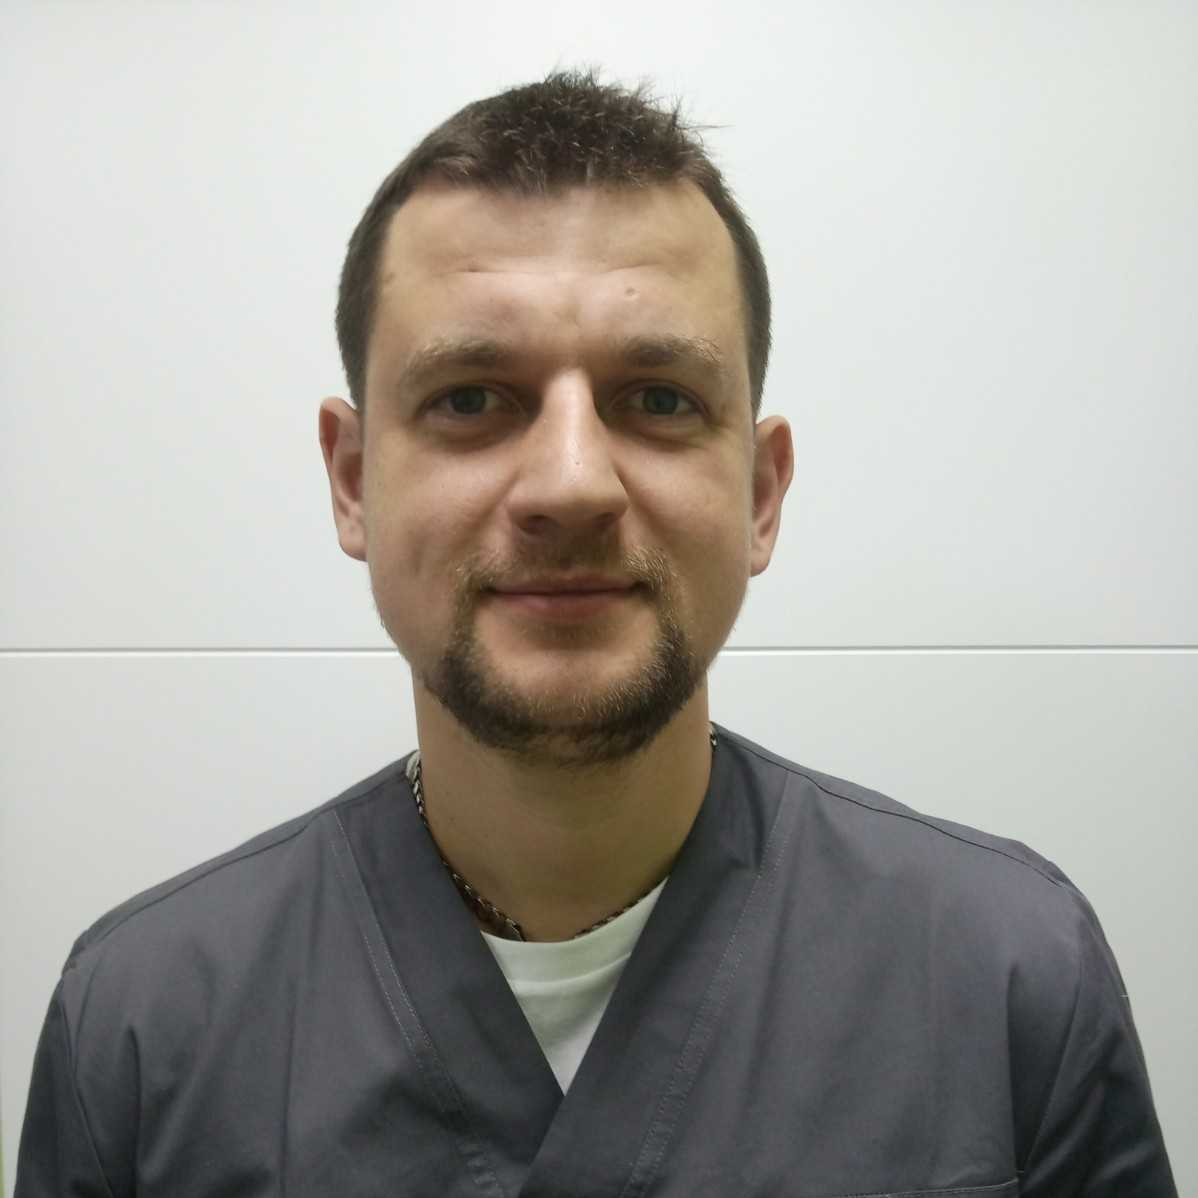 Вацкель Сергей Васильевич - фотография